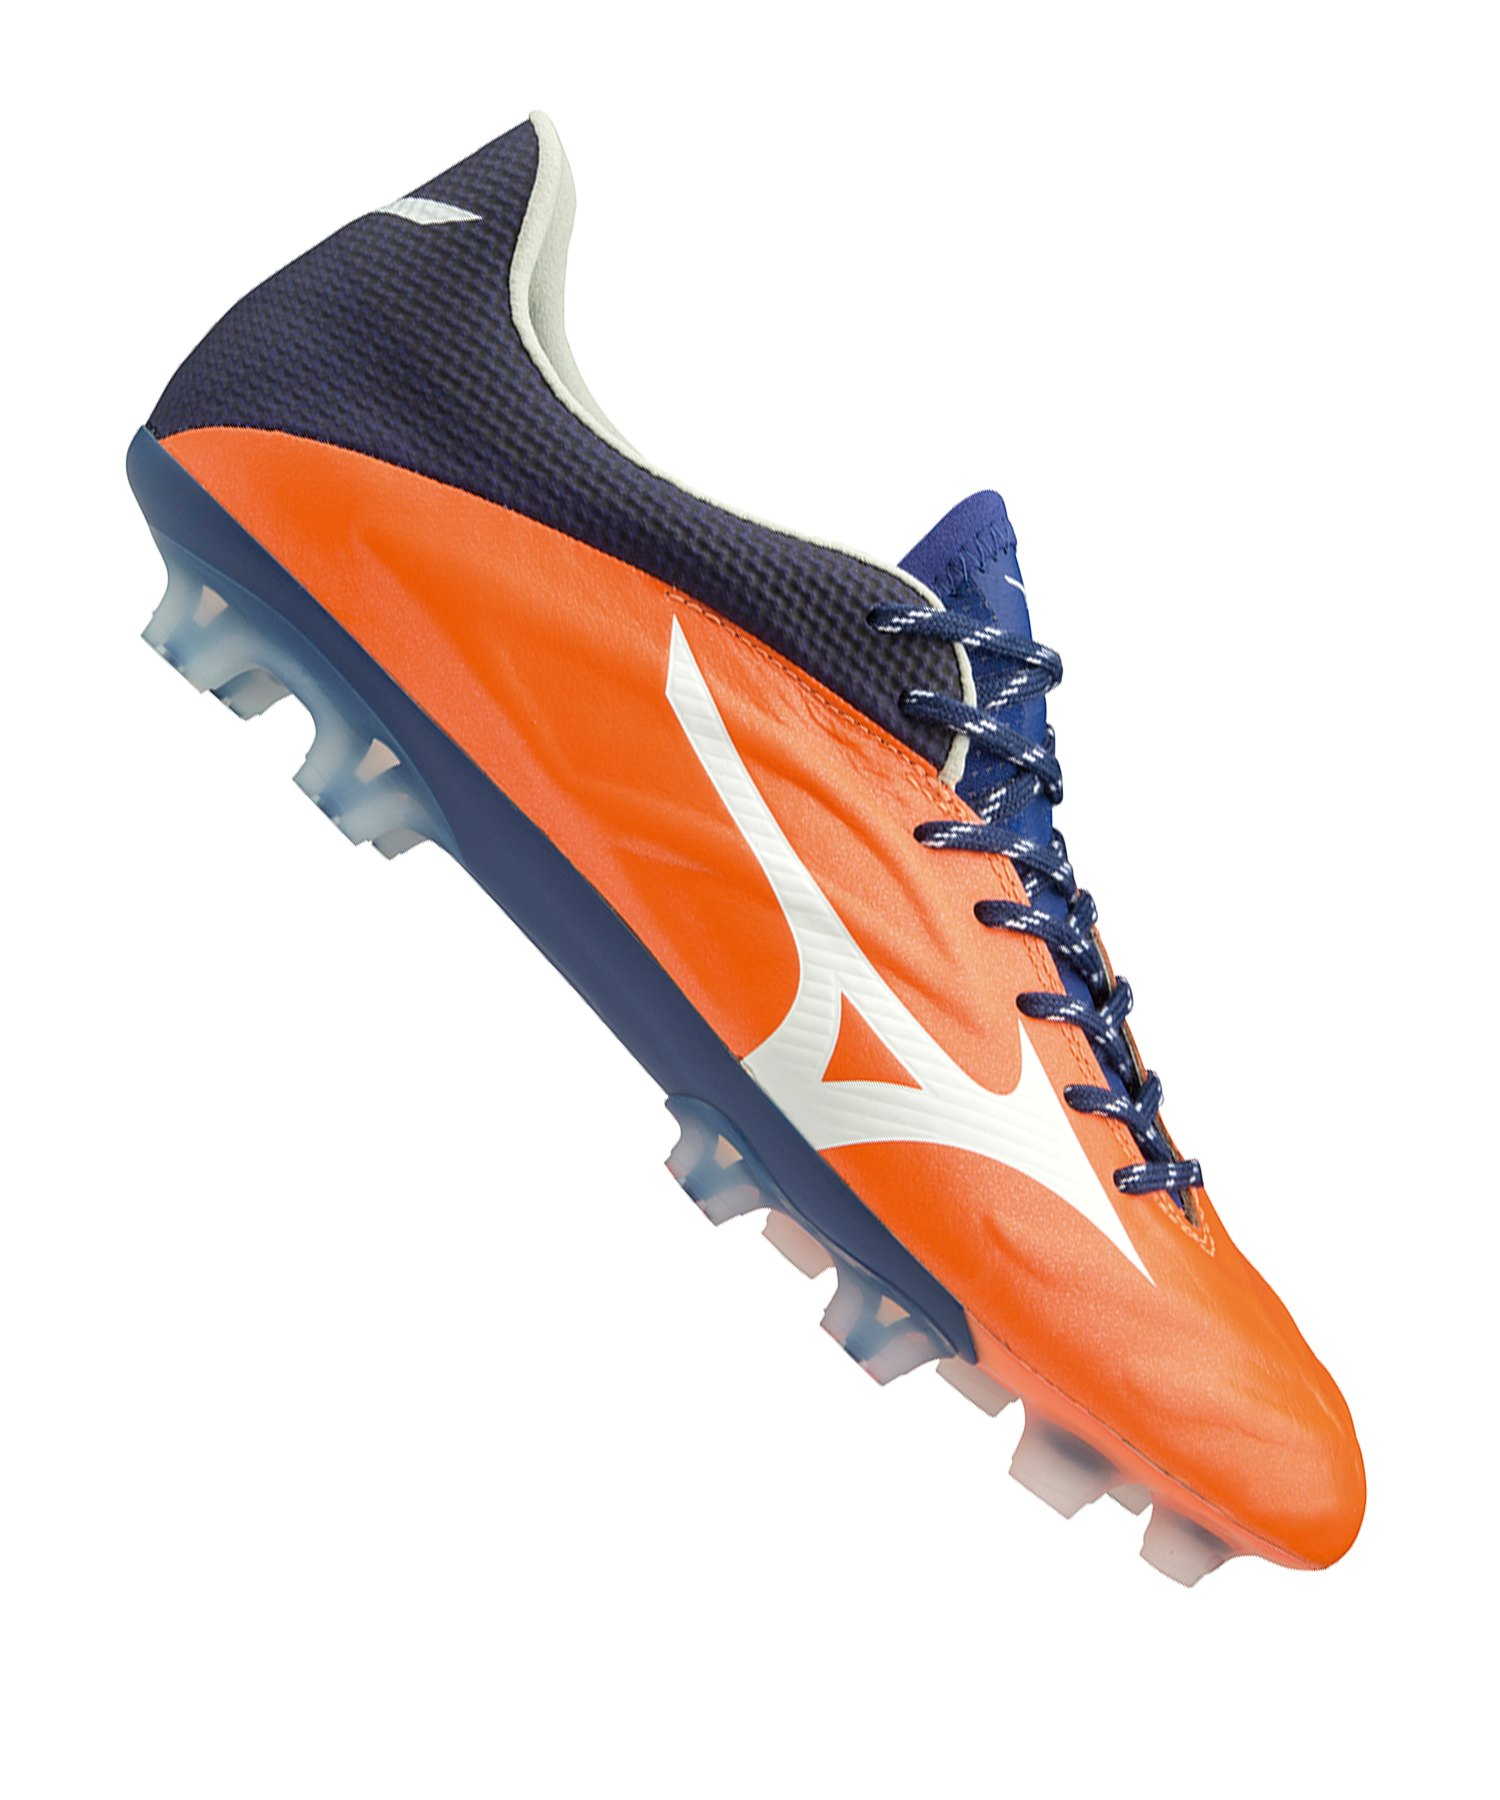 Mizuno Rebula 2 V1 Japan Leather FG Orange F54 - orange